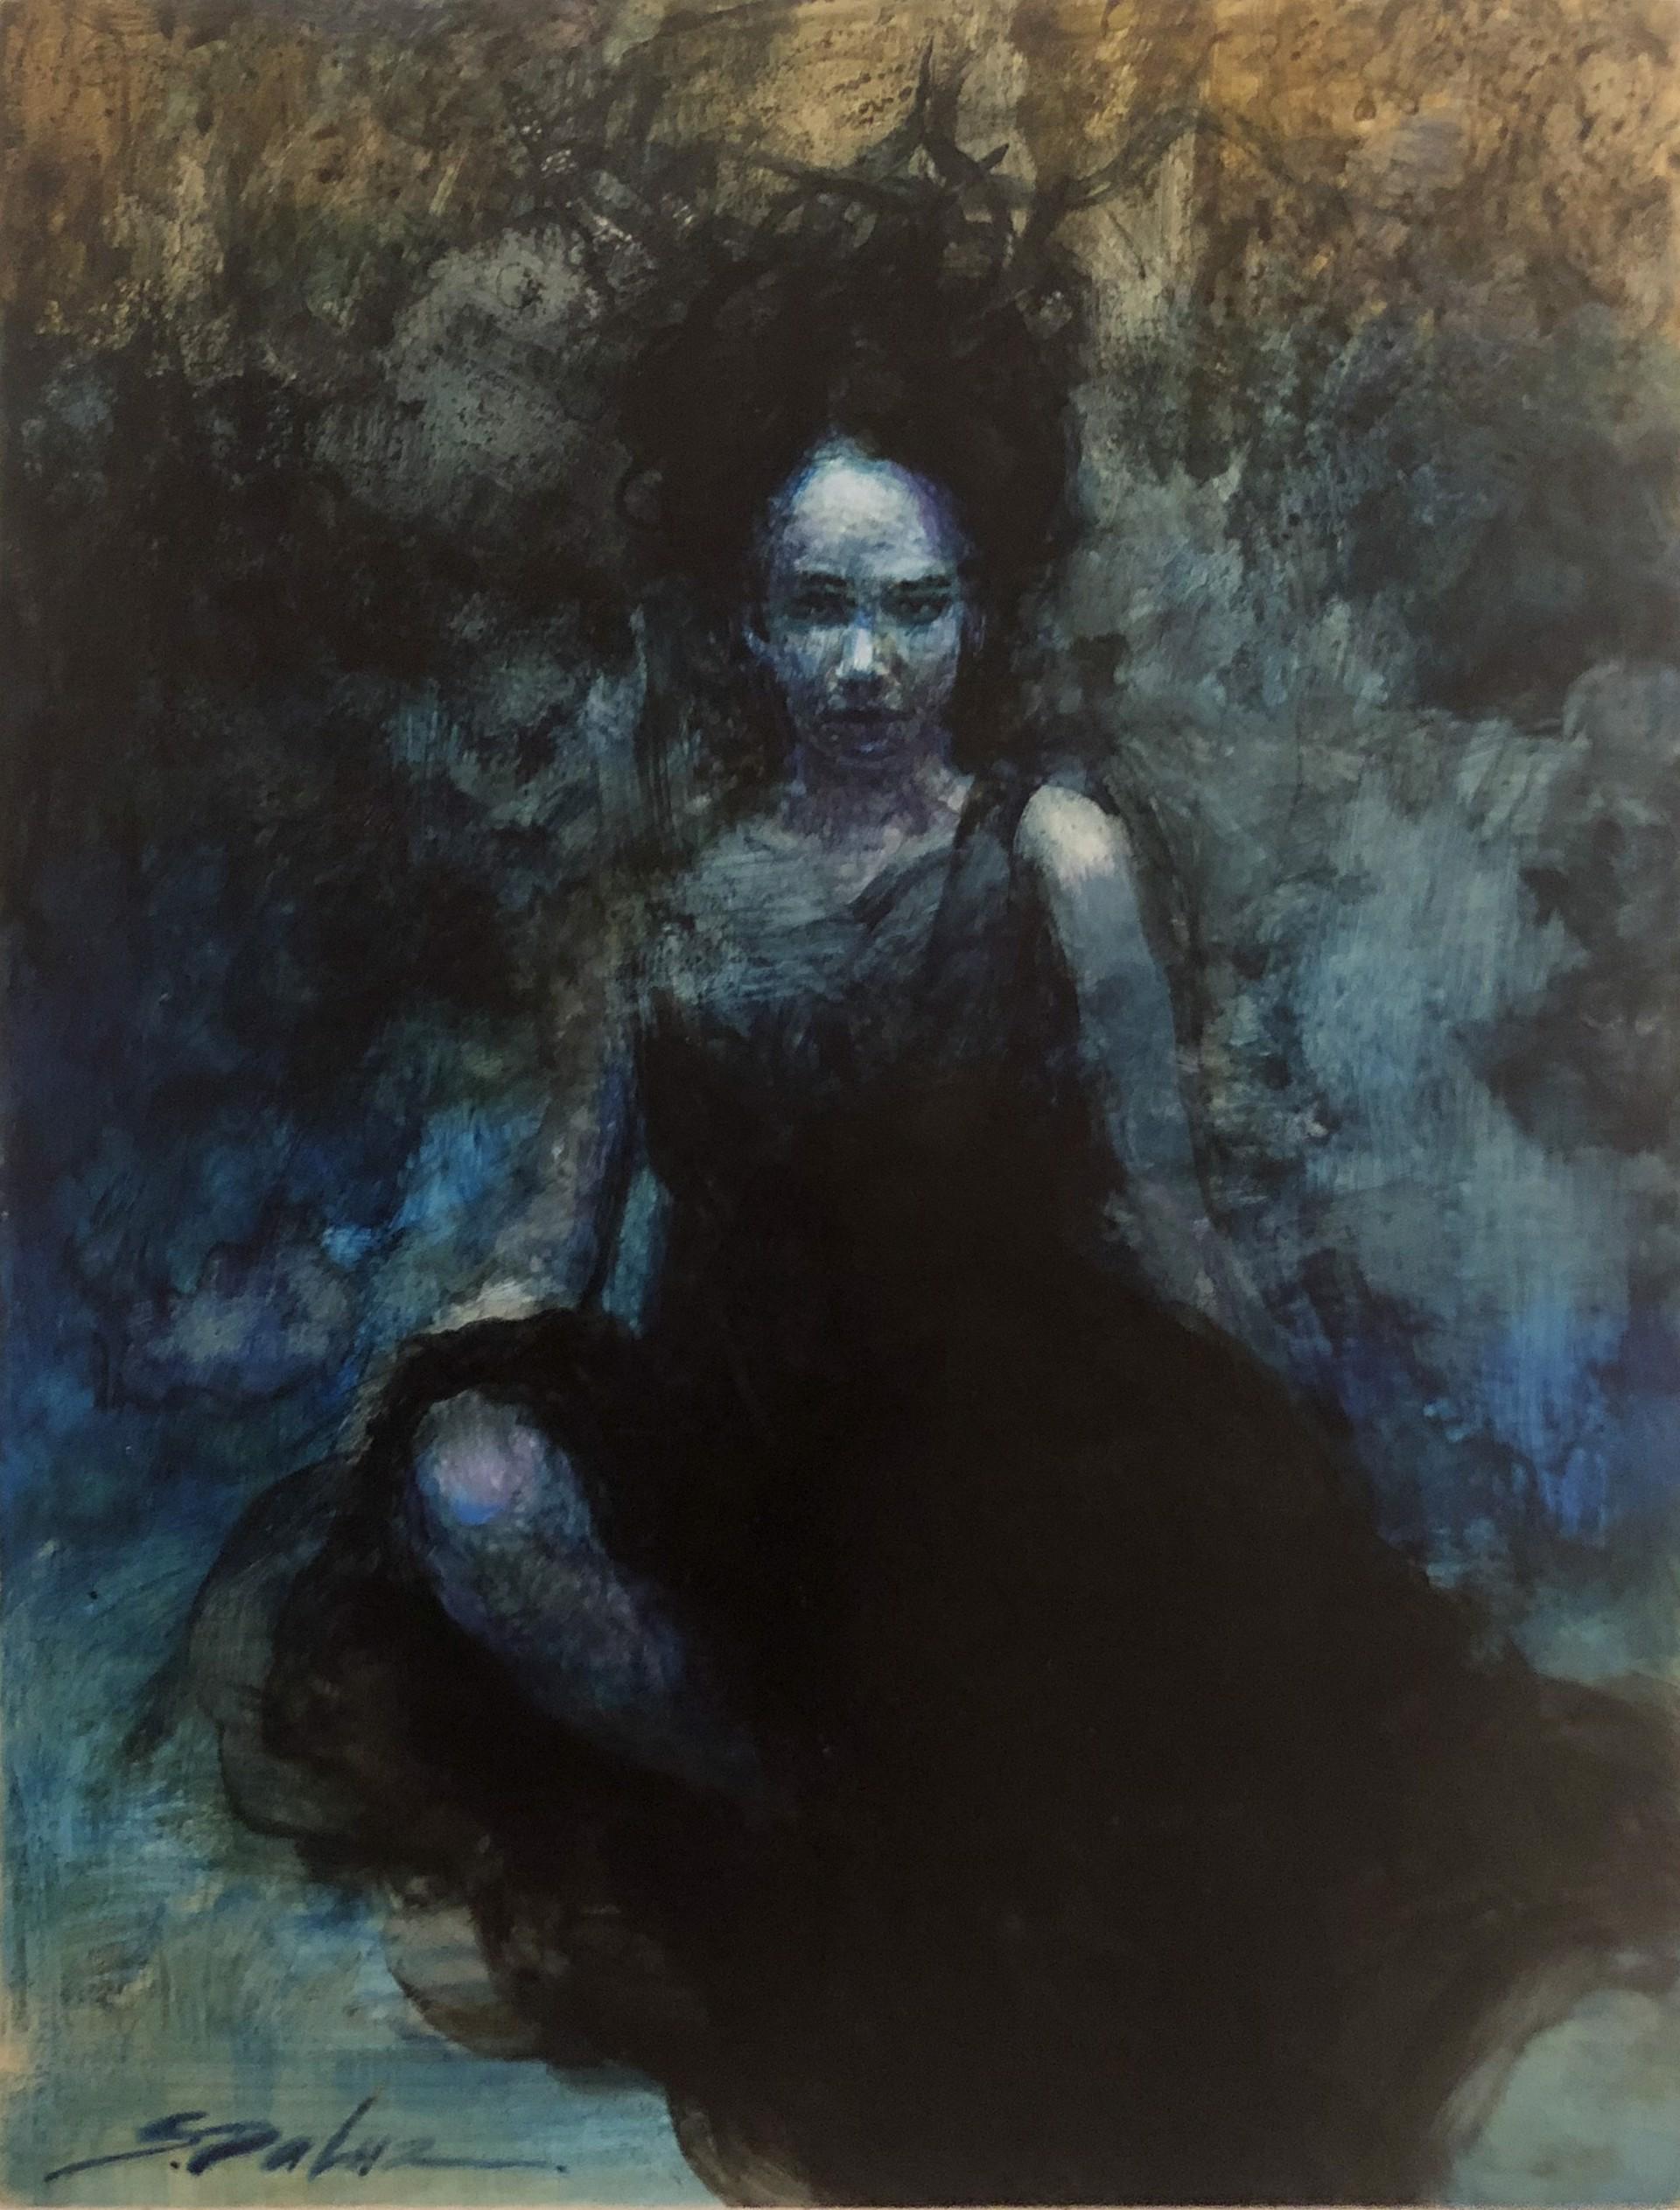 The Black Dress by Steven DaLuz